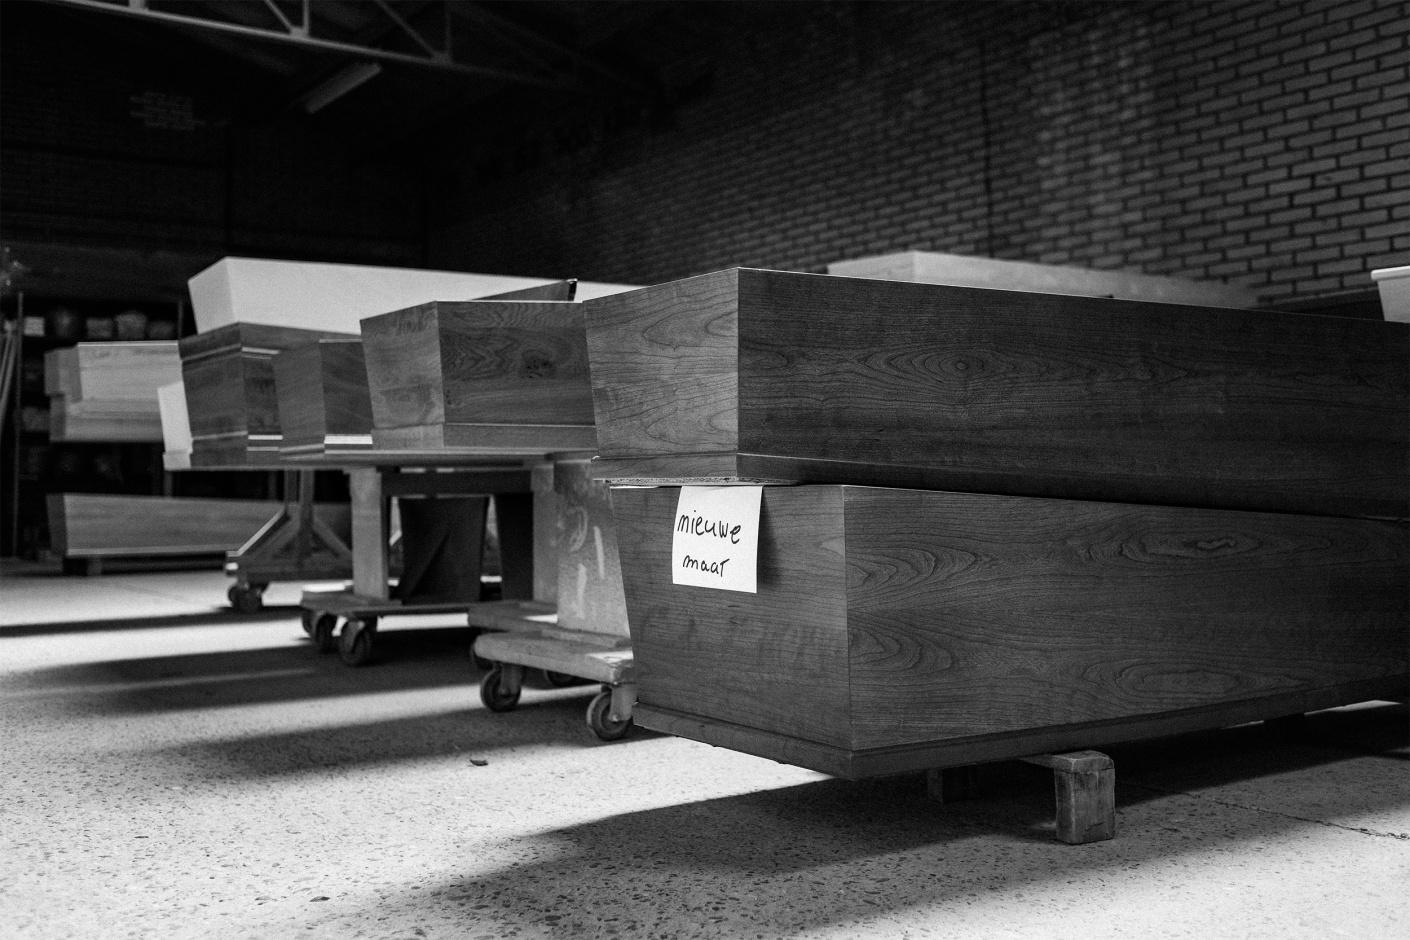 2 | De Kistenfabriek | CORONA | Jelle Pieter de Boer | 2020